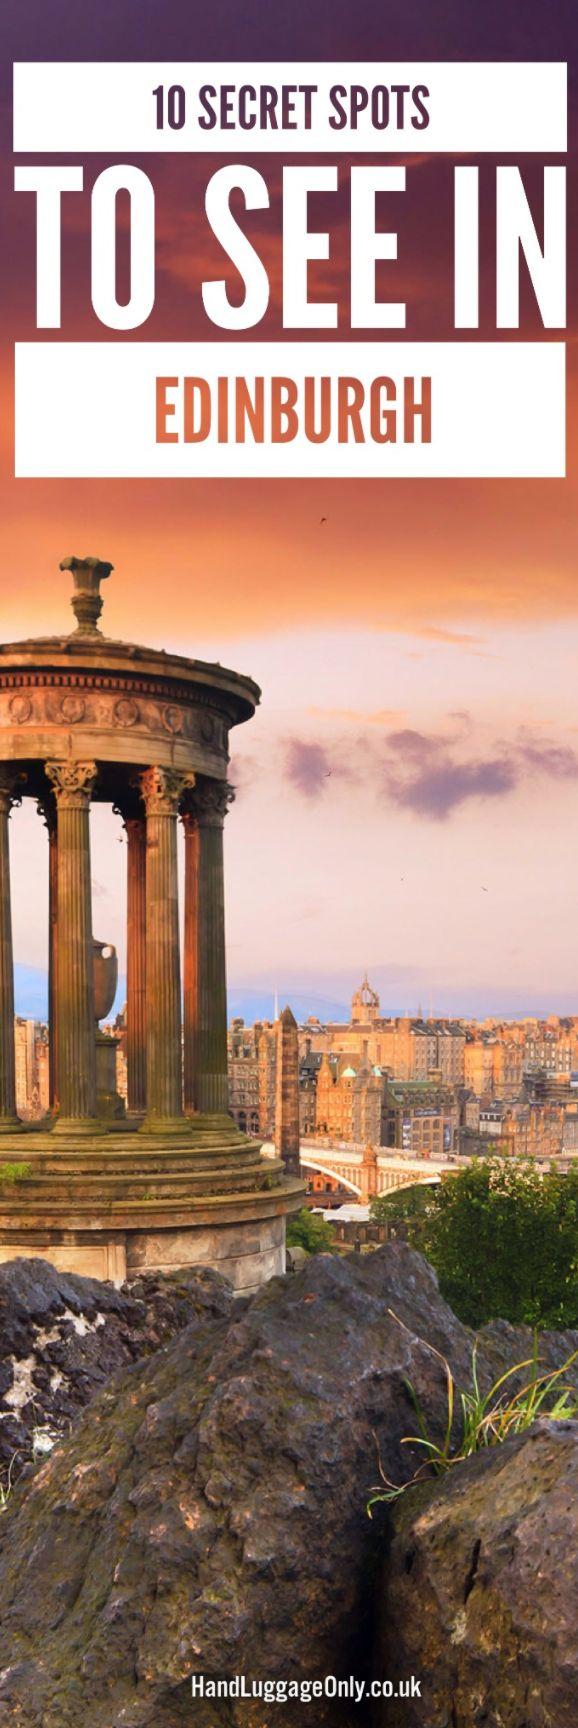 Edinburgh Spots Less Traveled